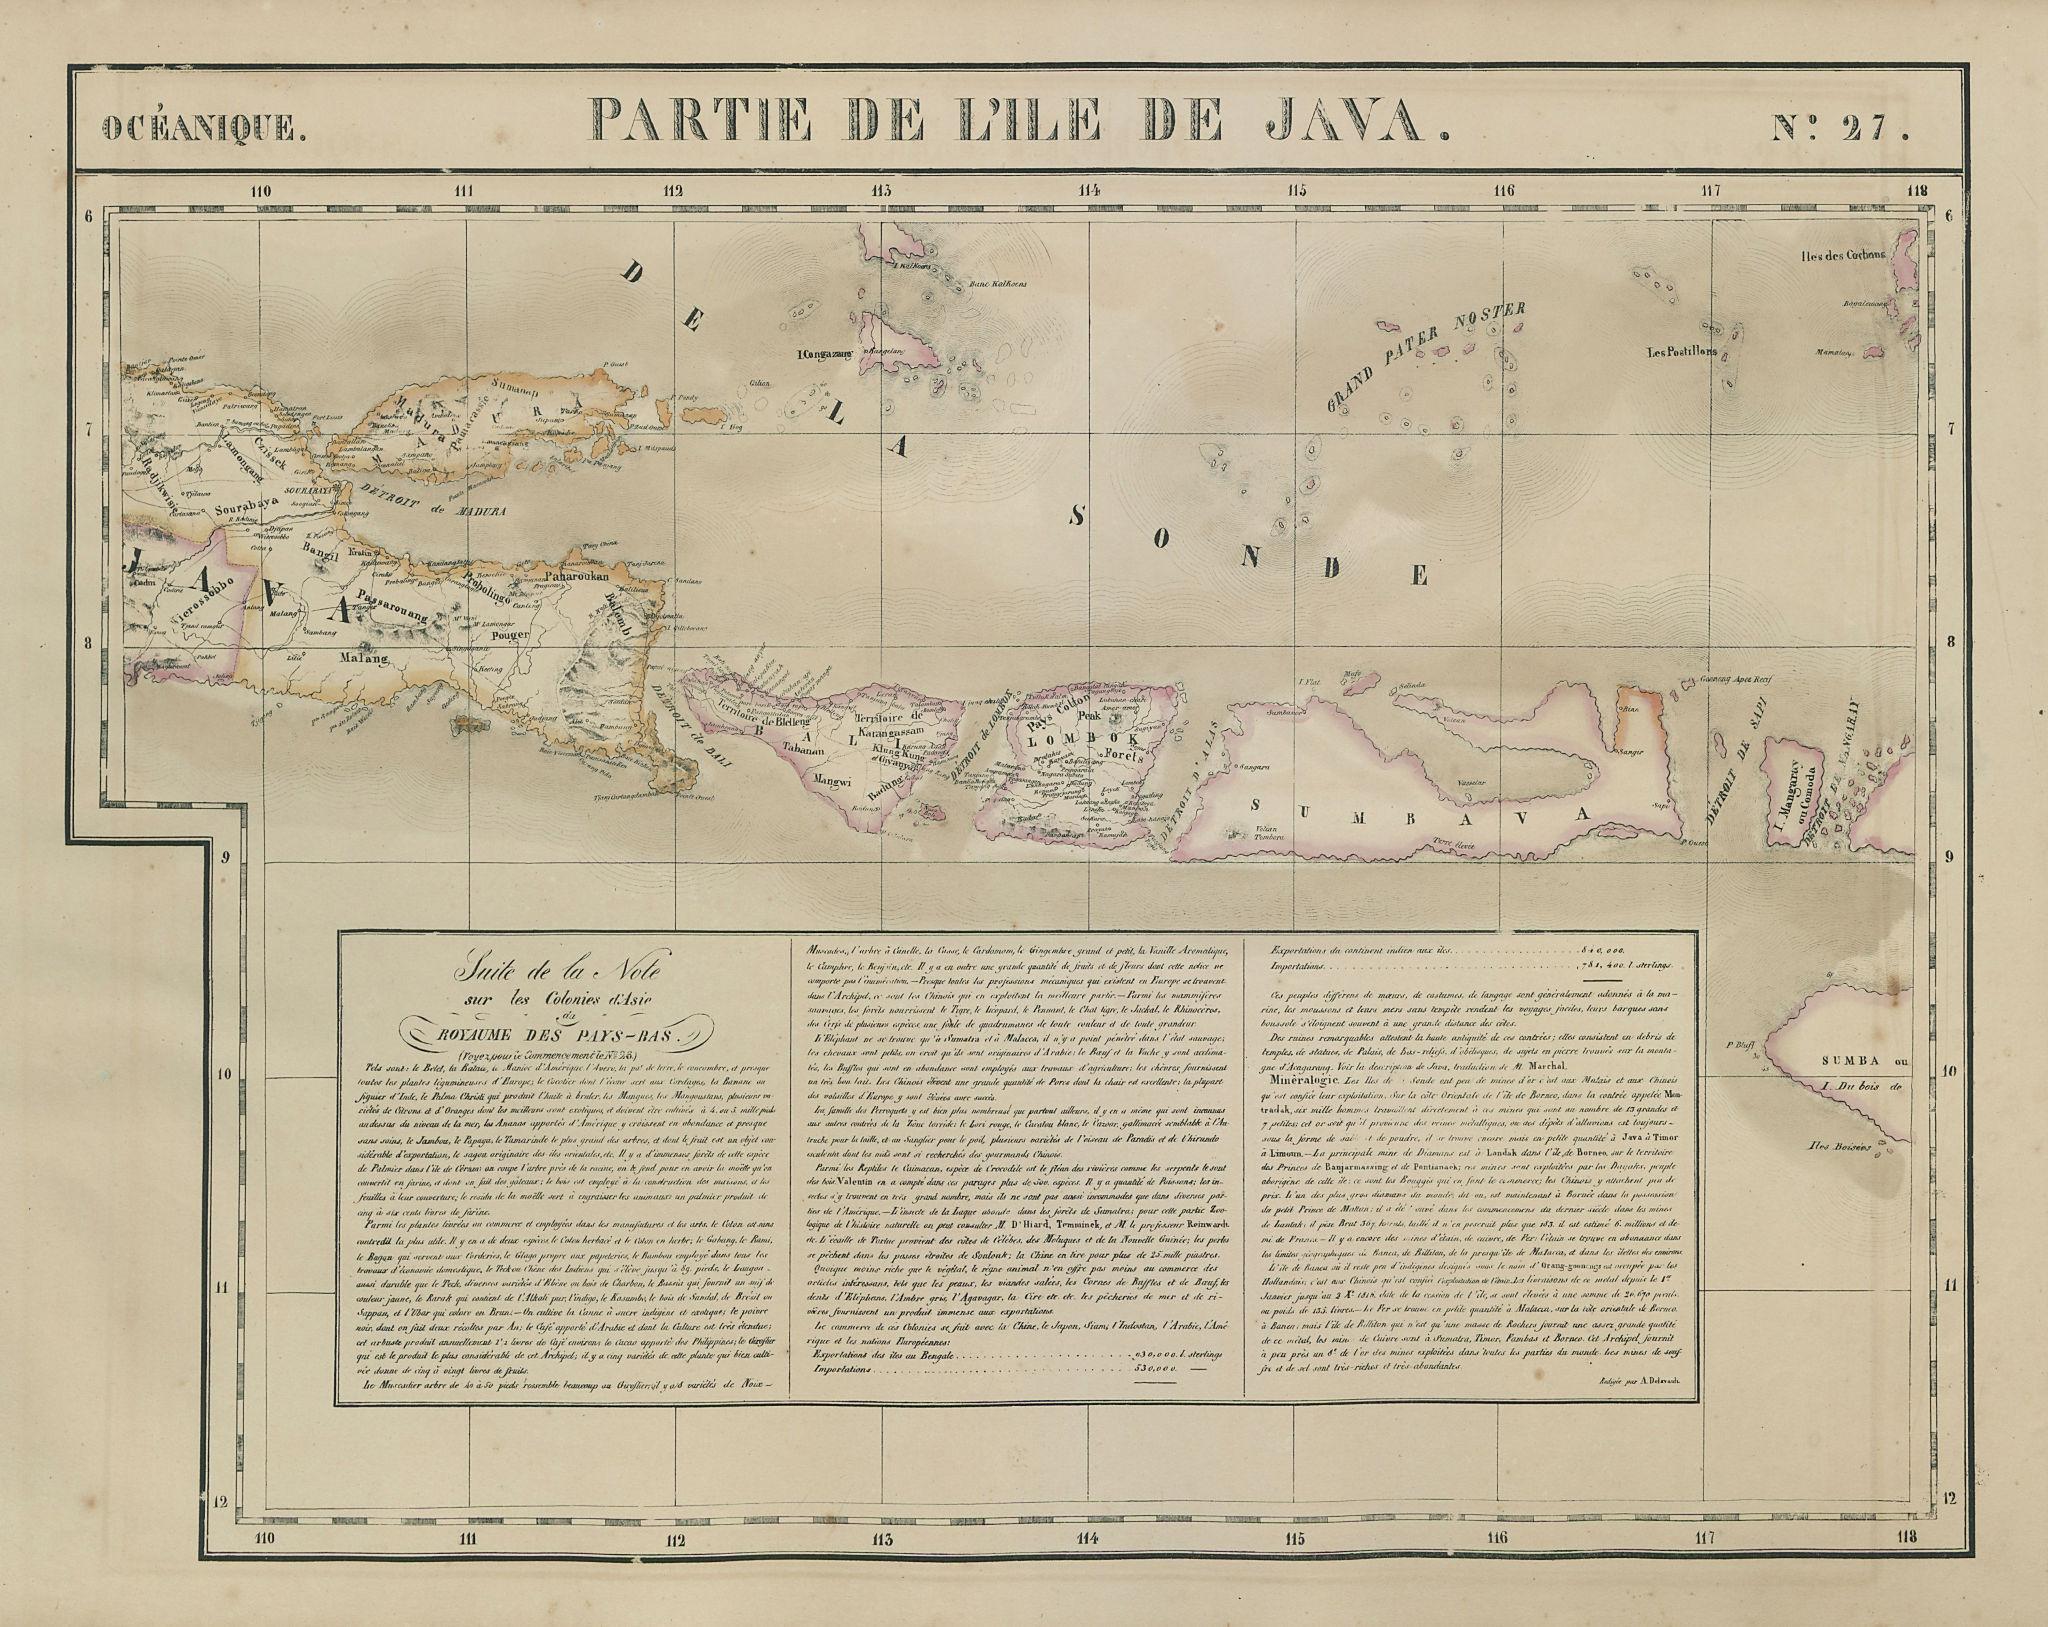 Océanique. Partie de l'ile de Java #27 Bali Lombok Sumbawa VANDERMAELEN 1827 map